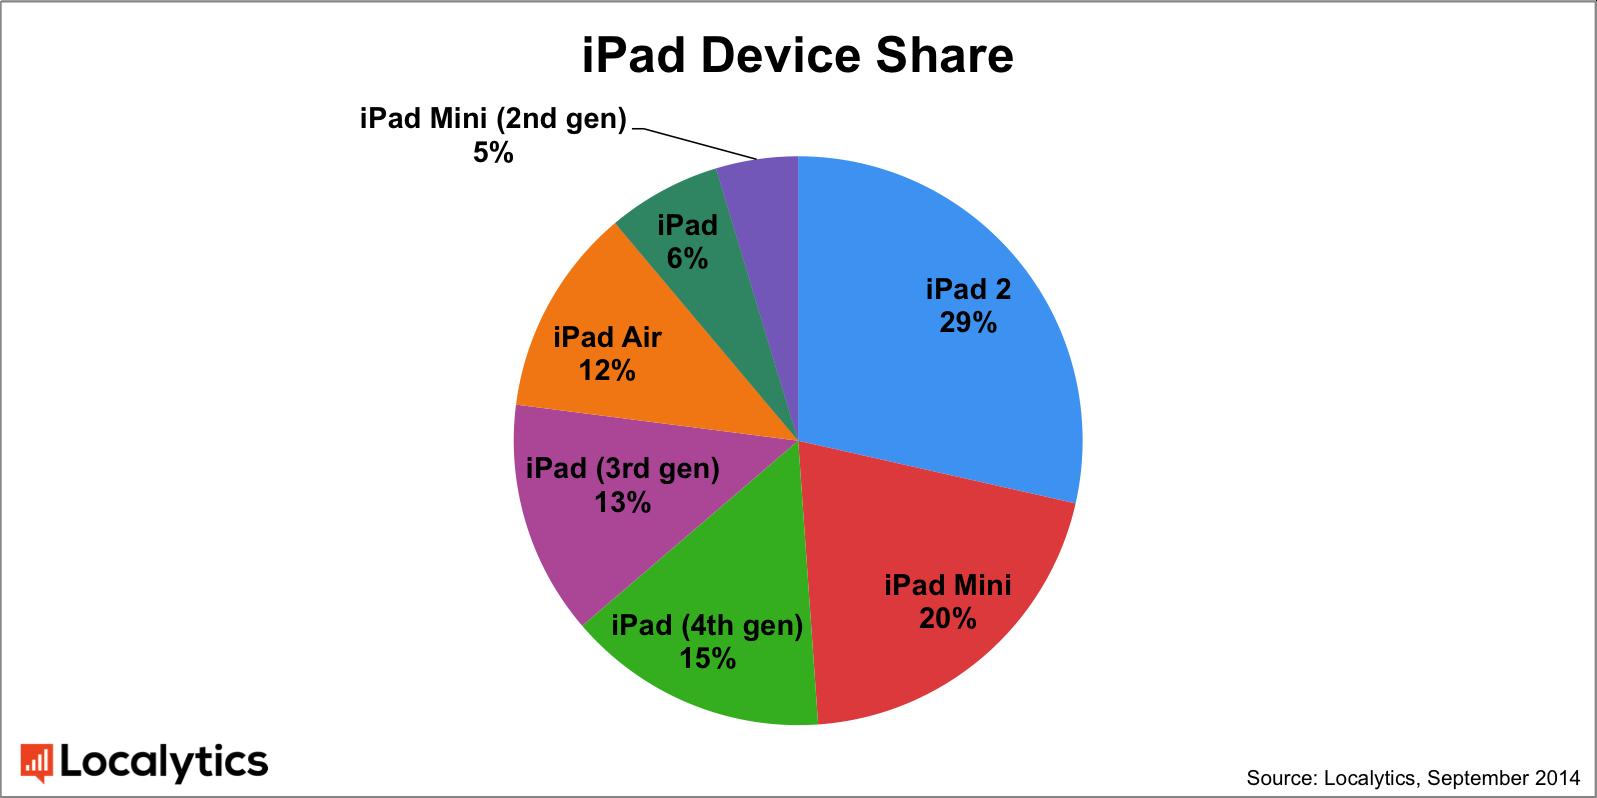 ipad_device_share